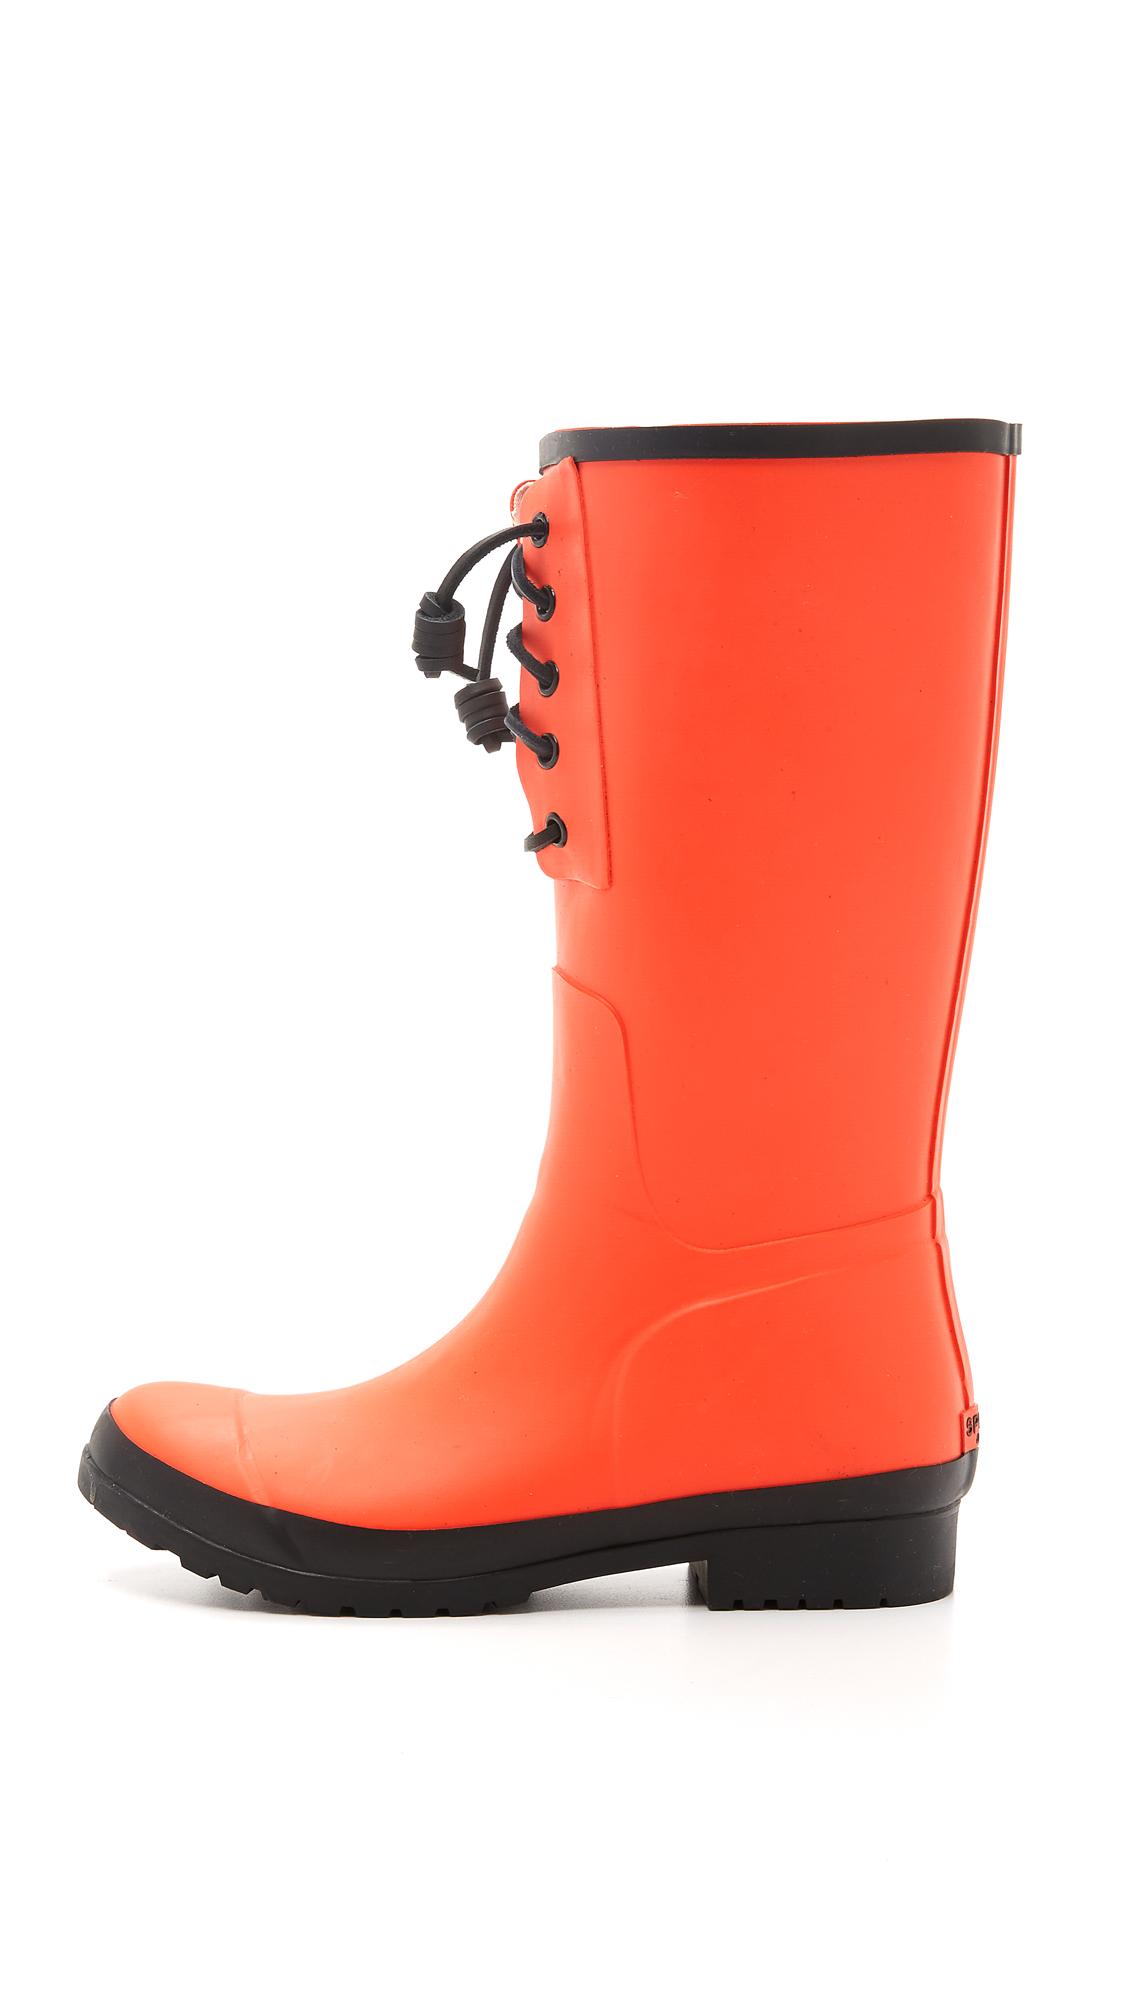 Women Rain Boots And Shoes Hot Girls Wallpaper